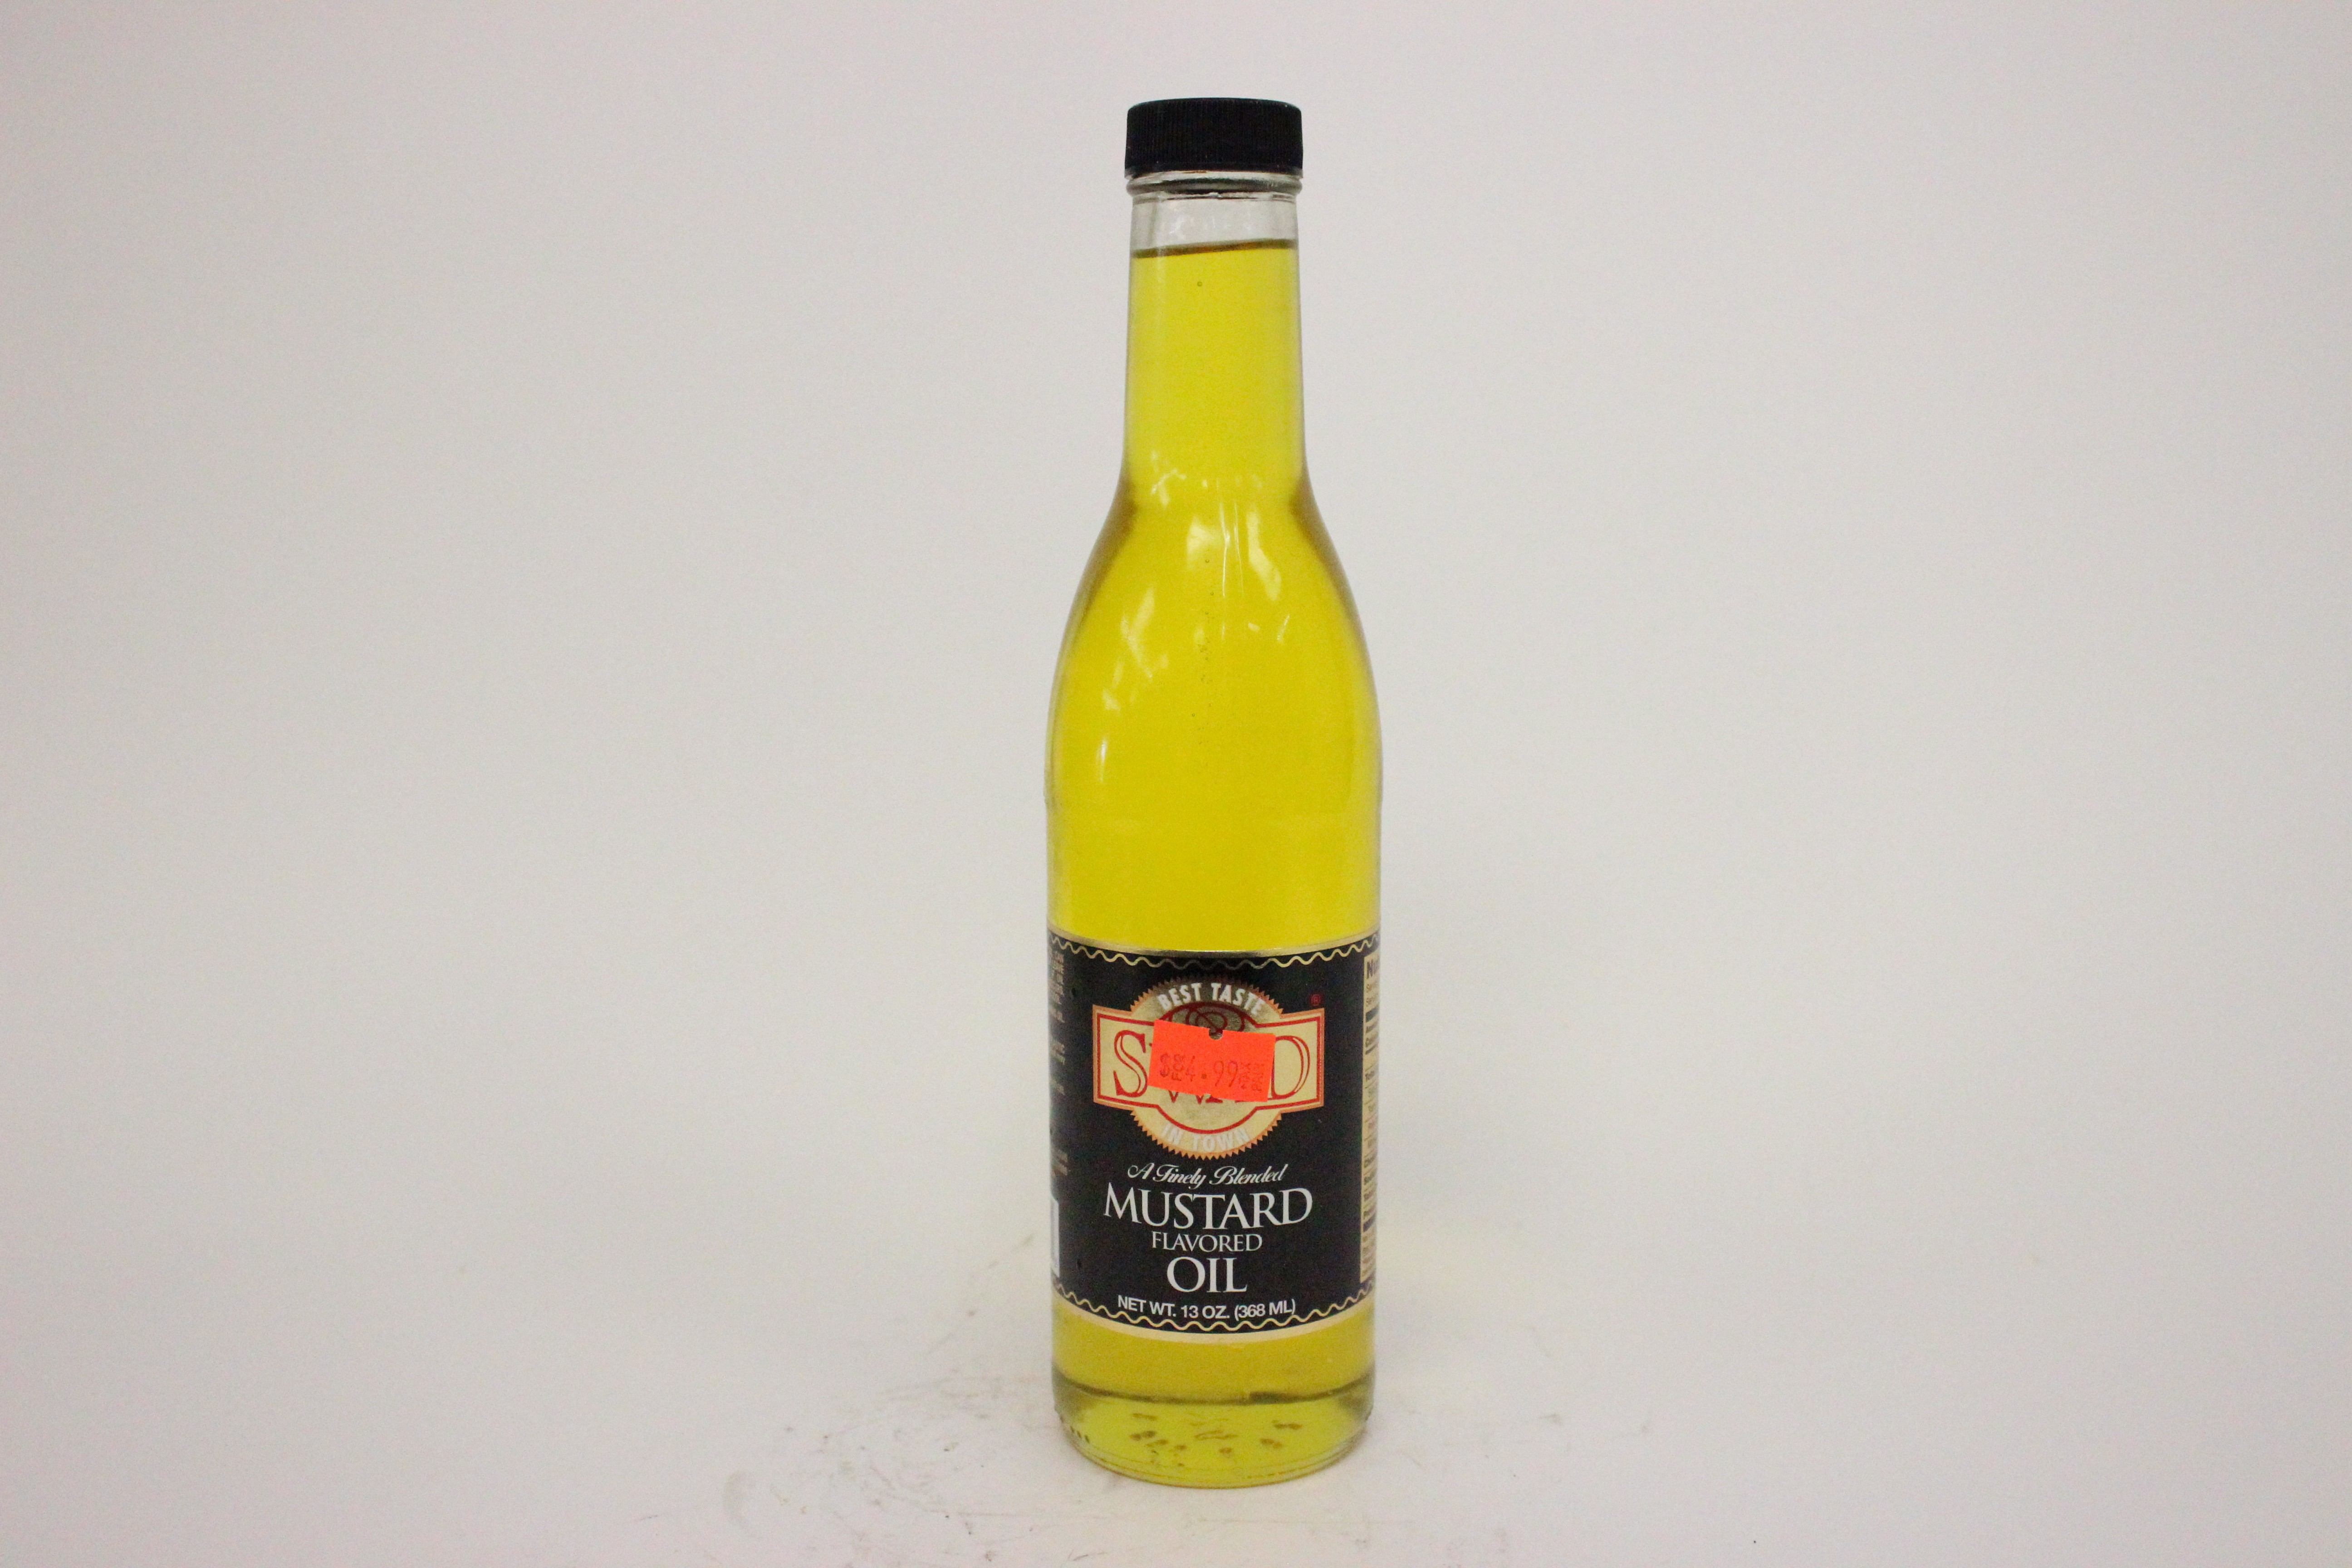 Swad Mustard  Oil Flavoured 12 oz